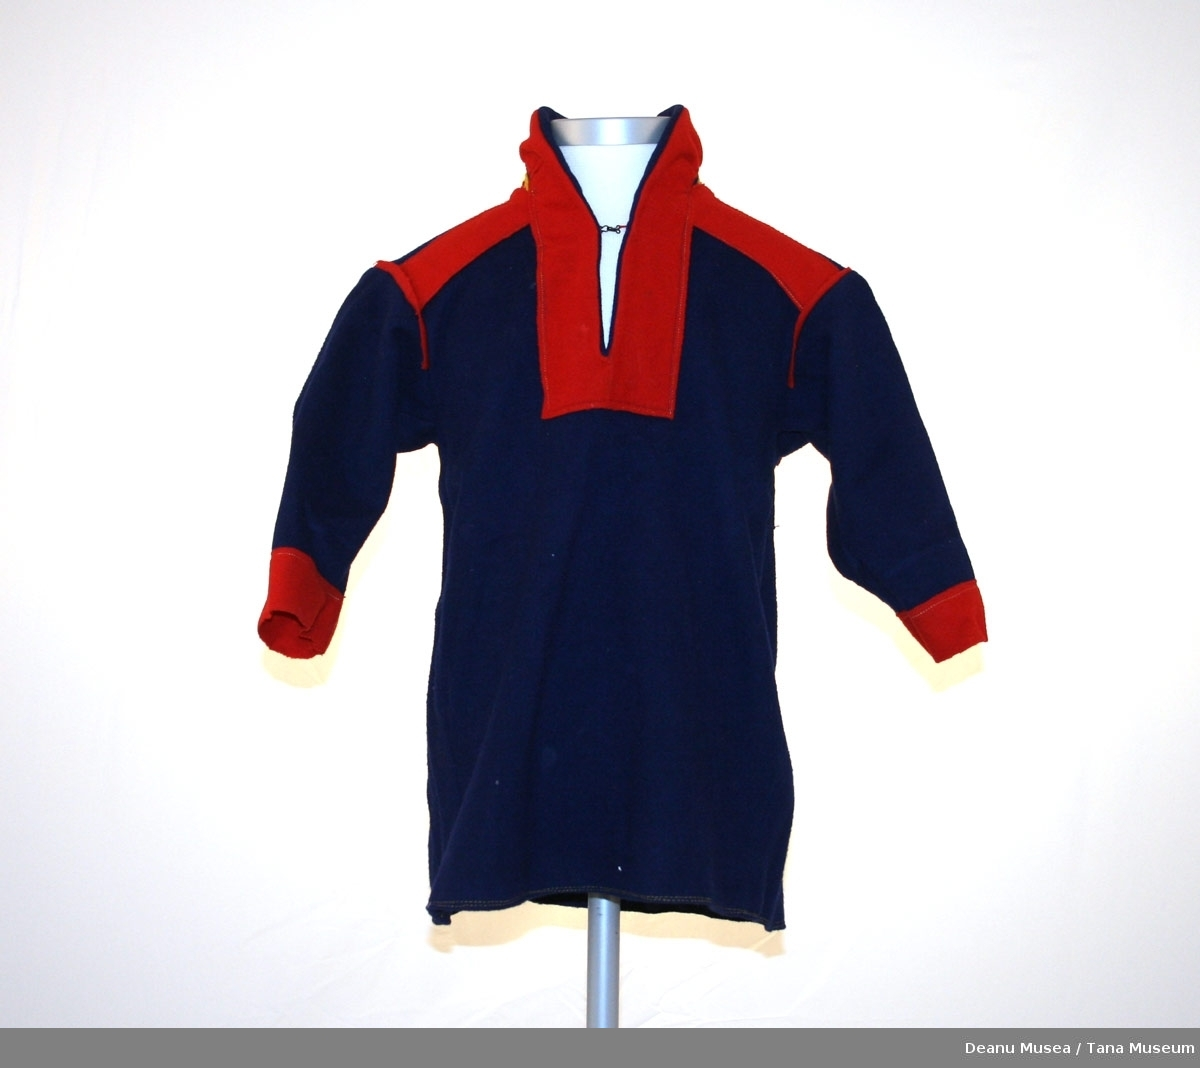 Mørkeblå barnekofte (4 år). Rød ermer/hals. Rød og gul polmak mønster på rygg og skulder.